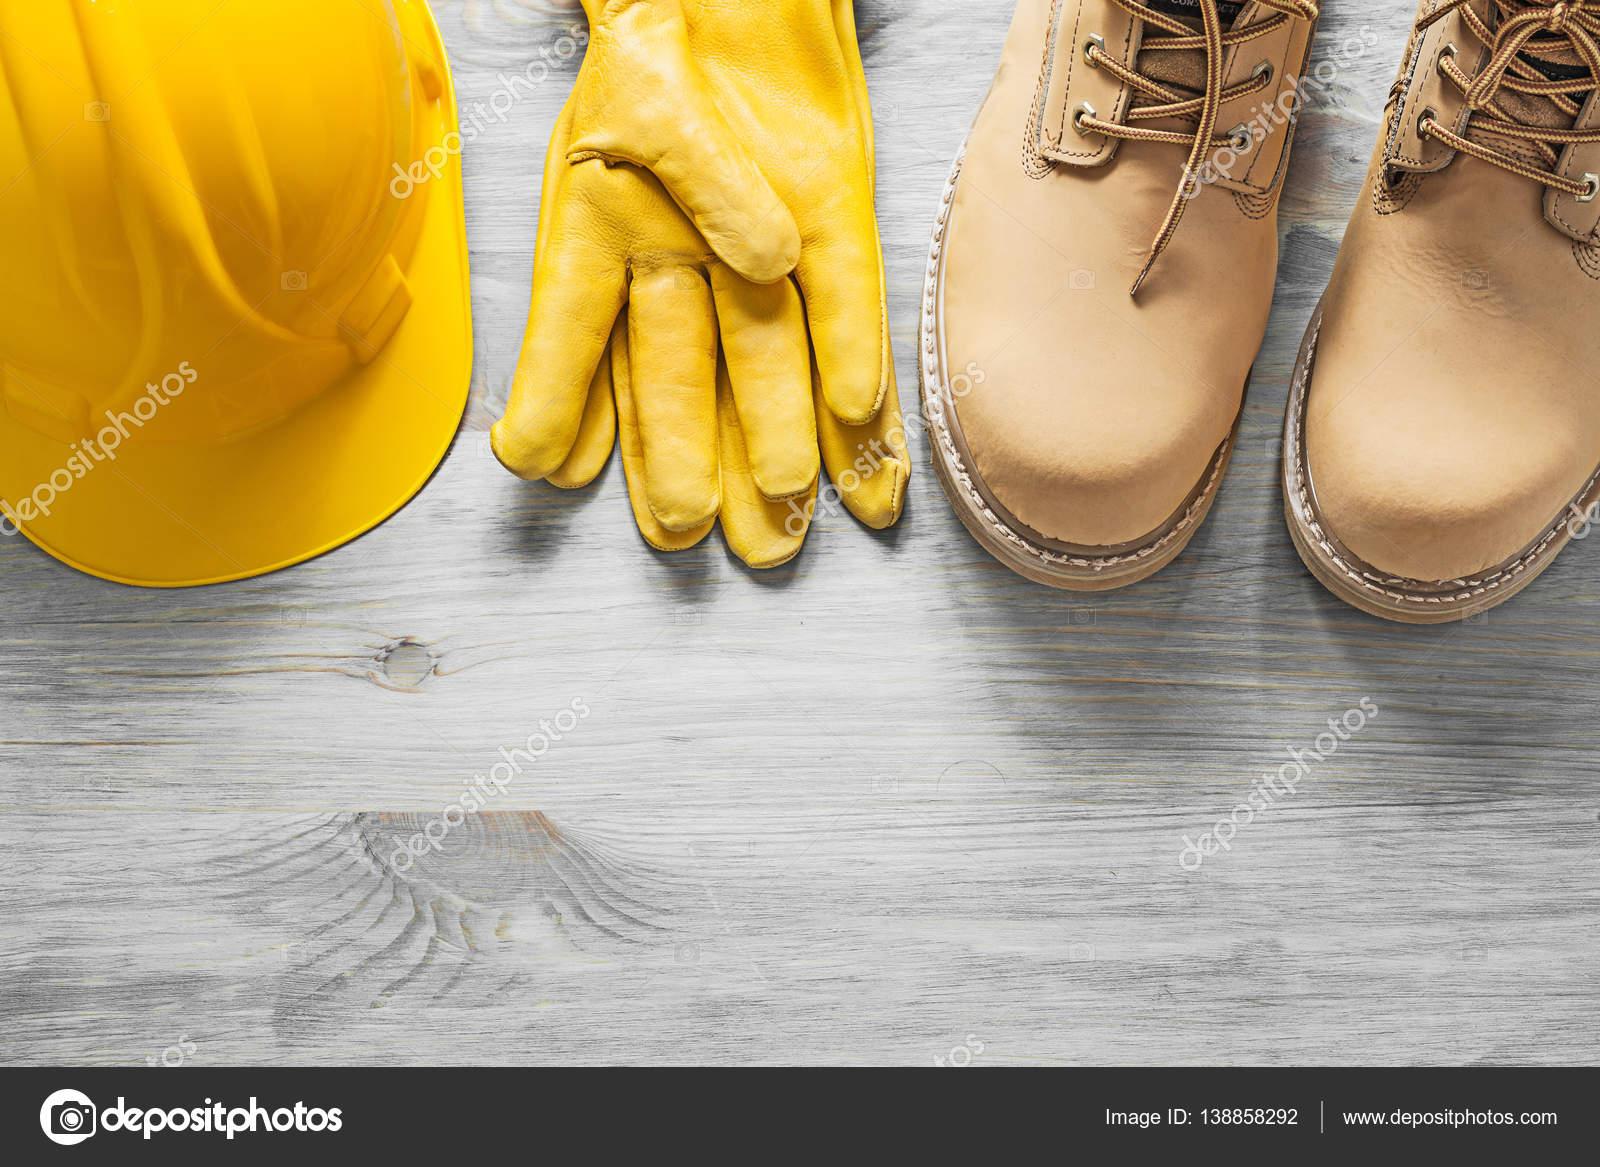 b487f1e2aac Ζευγάρι των αδιάβροχη μπότες κράνος Γάντια ασφάλειας δέρματος για  επαγγελμα– εικόνα αρχείου